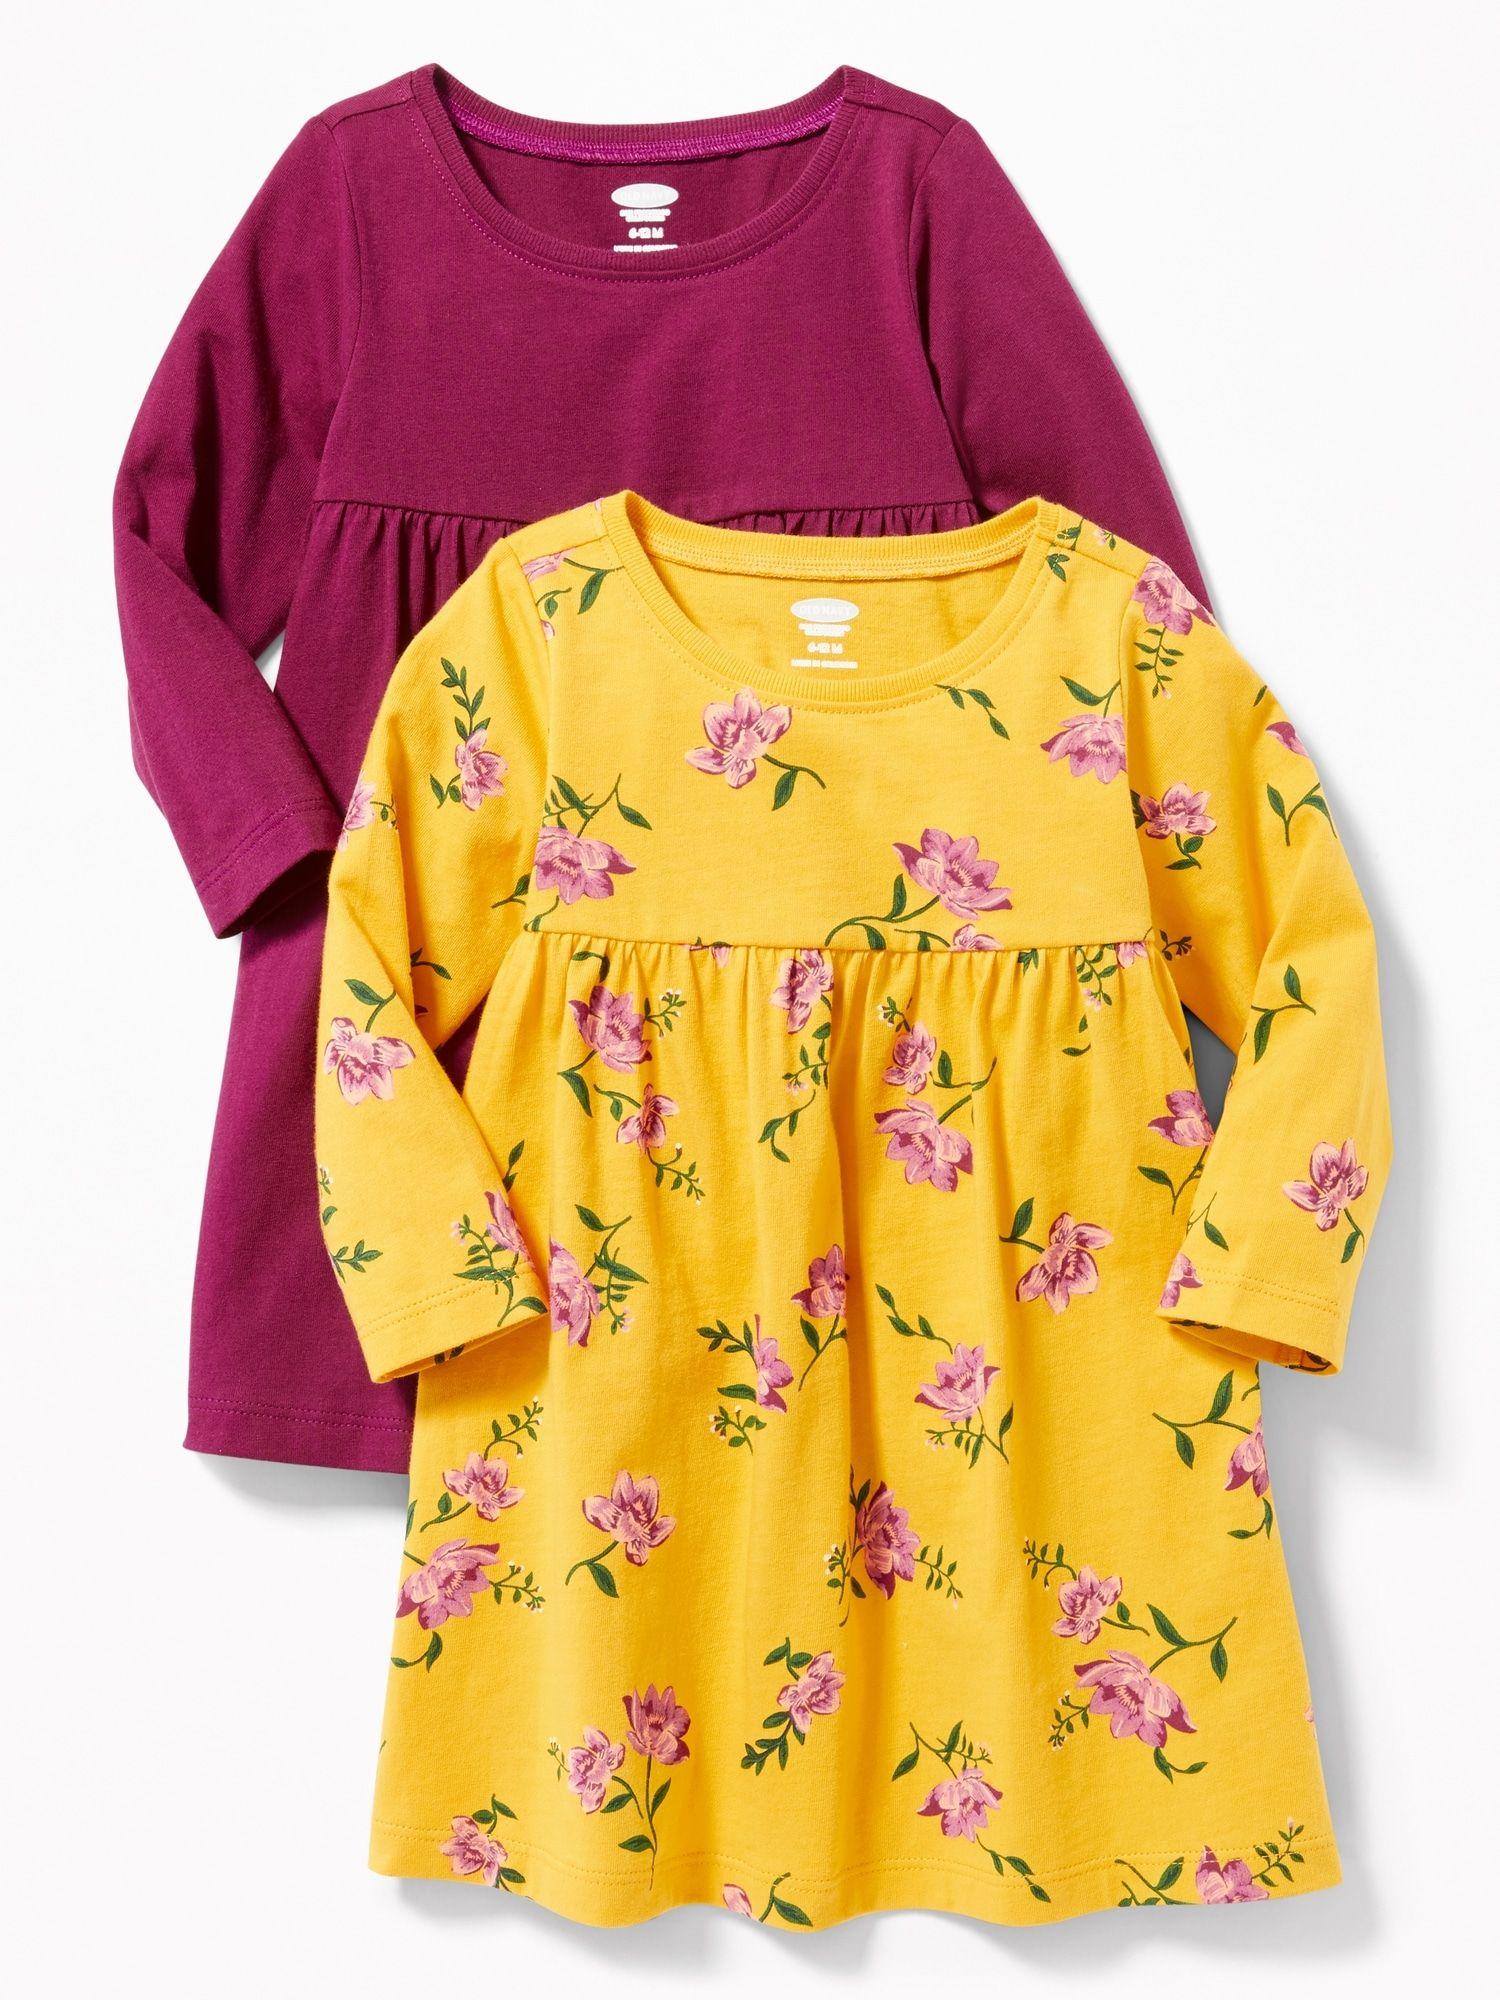 Old navy baby girl yellow dress